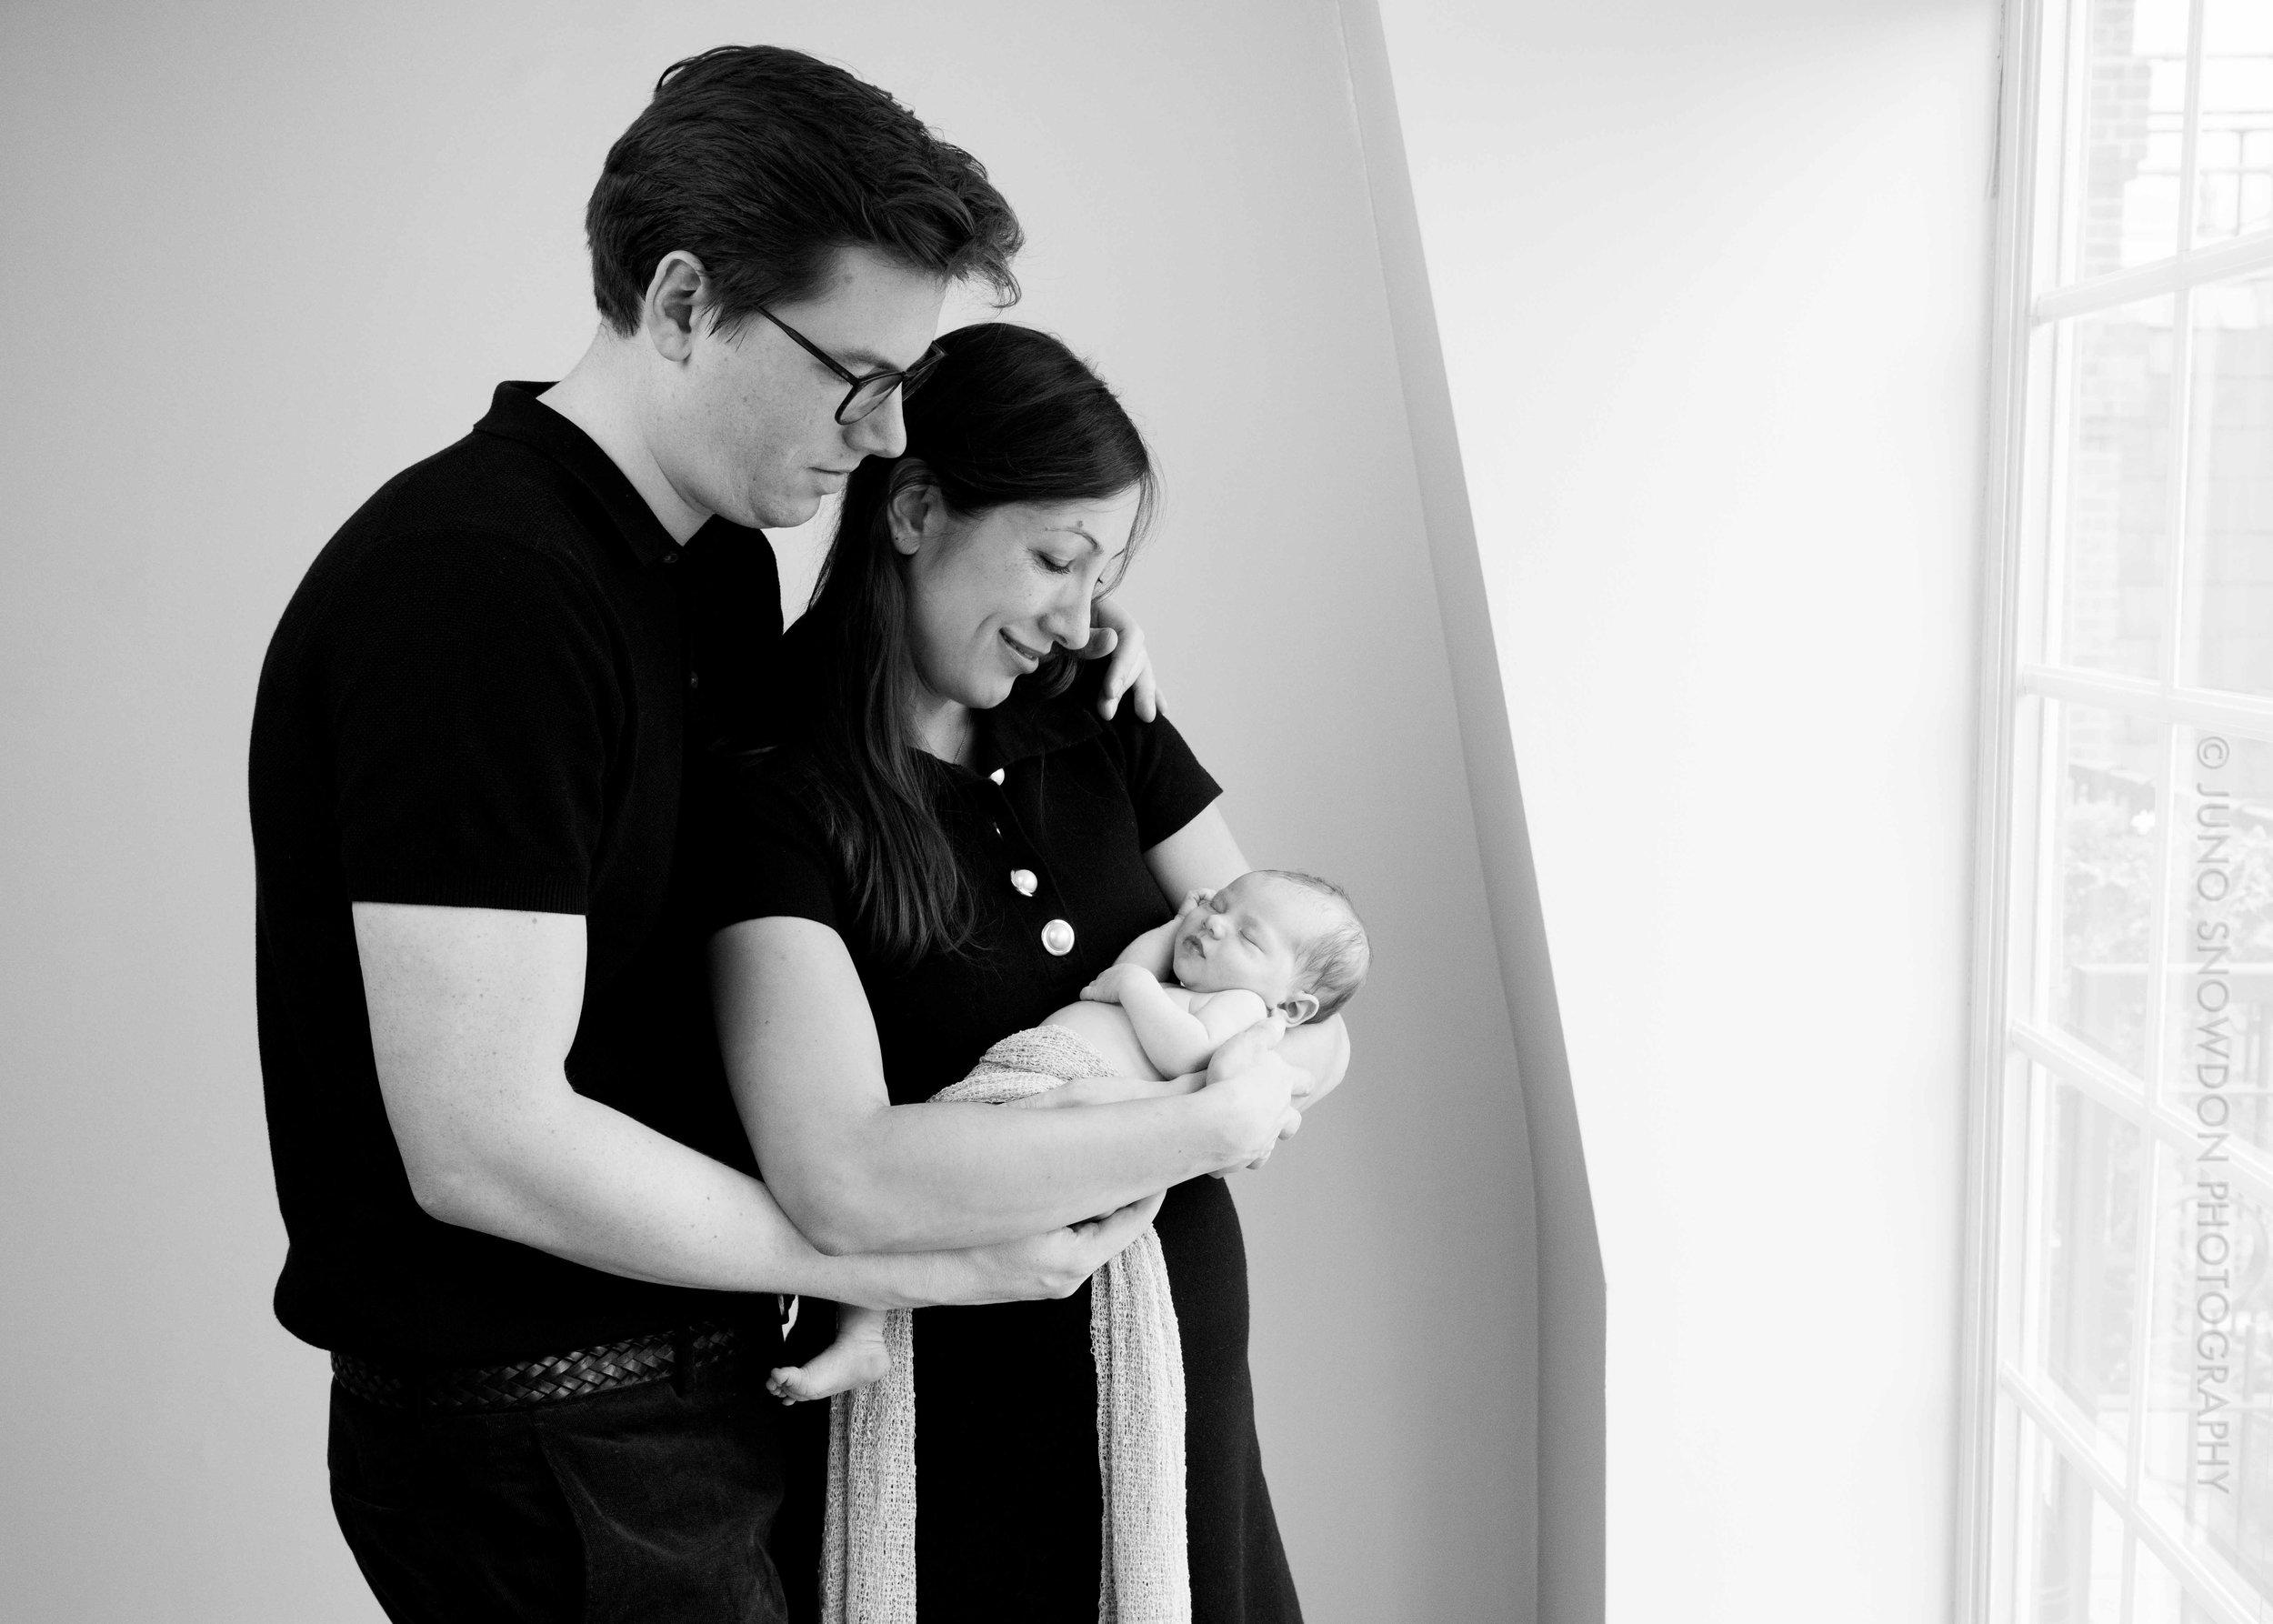 juno-snowdon-photography-newborn-portrait-7189.jpg